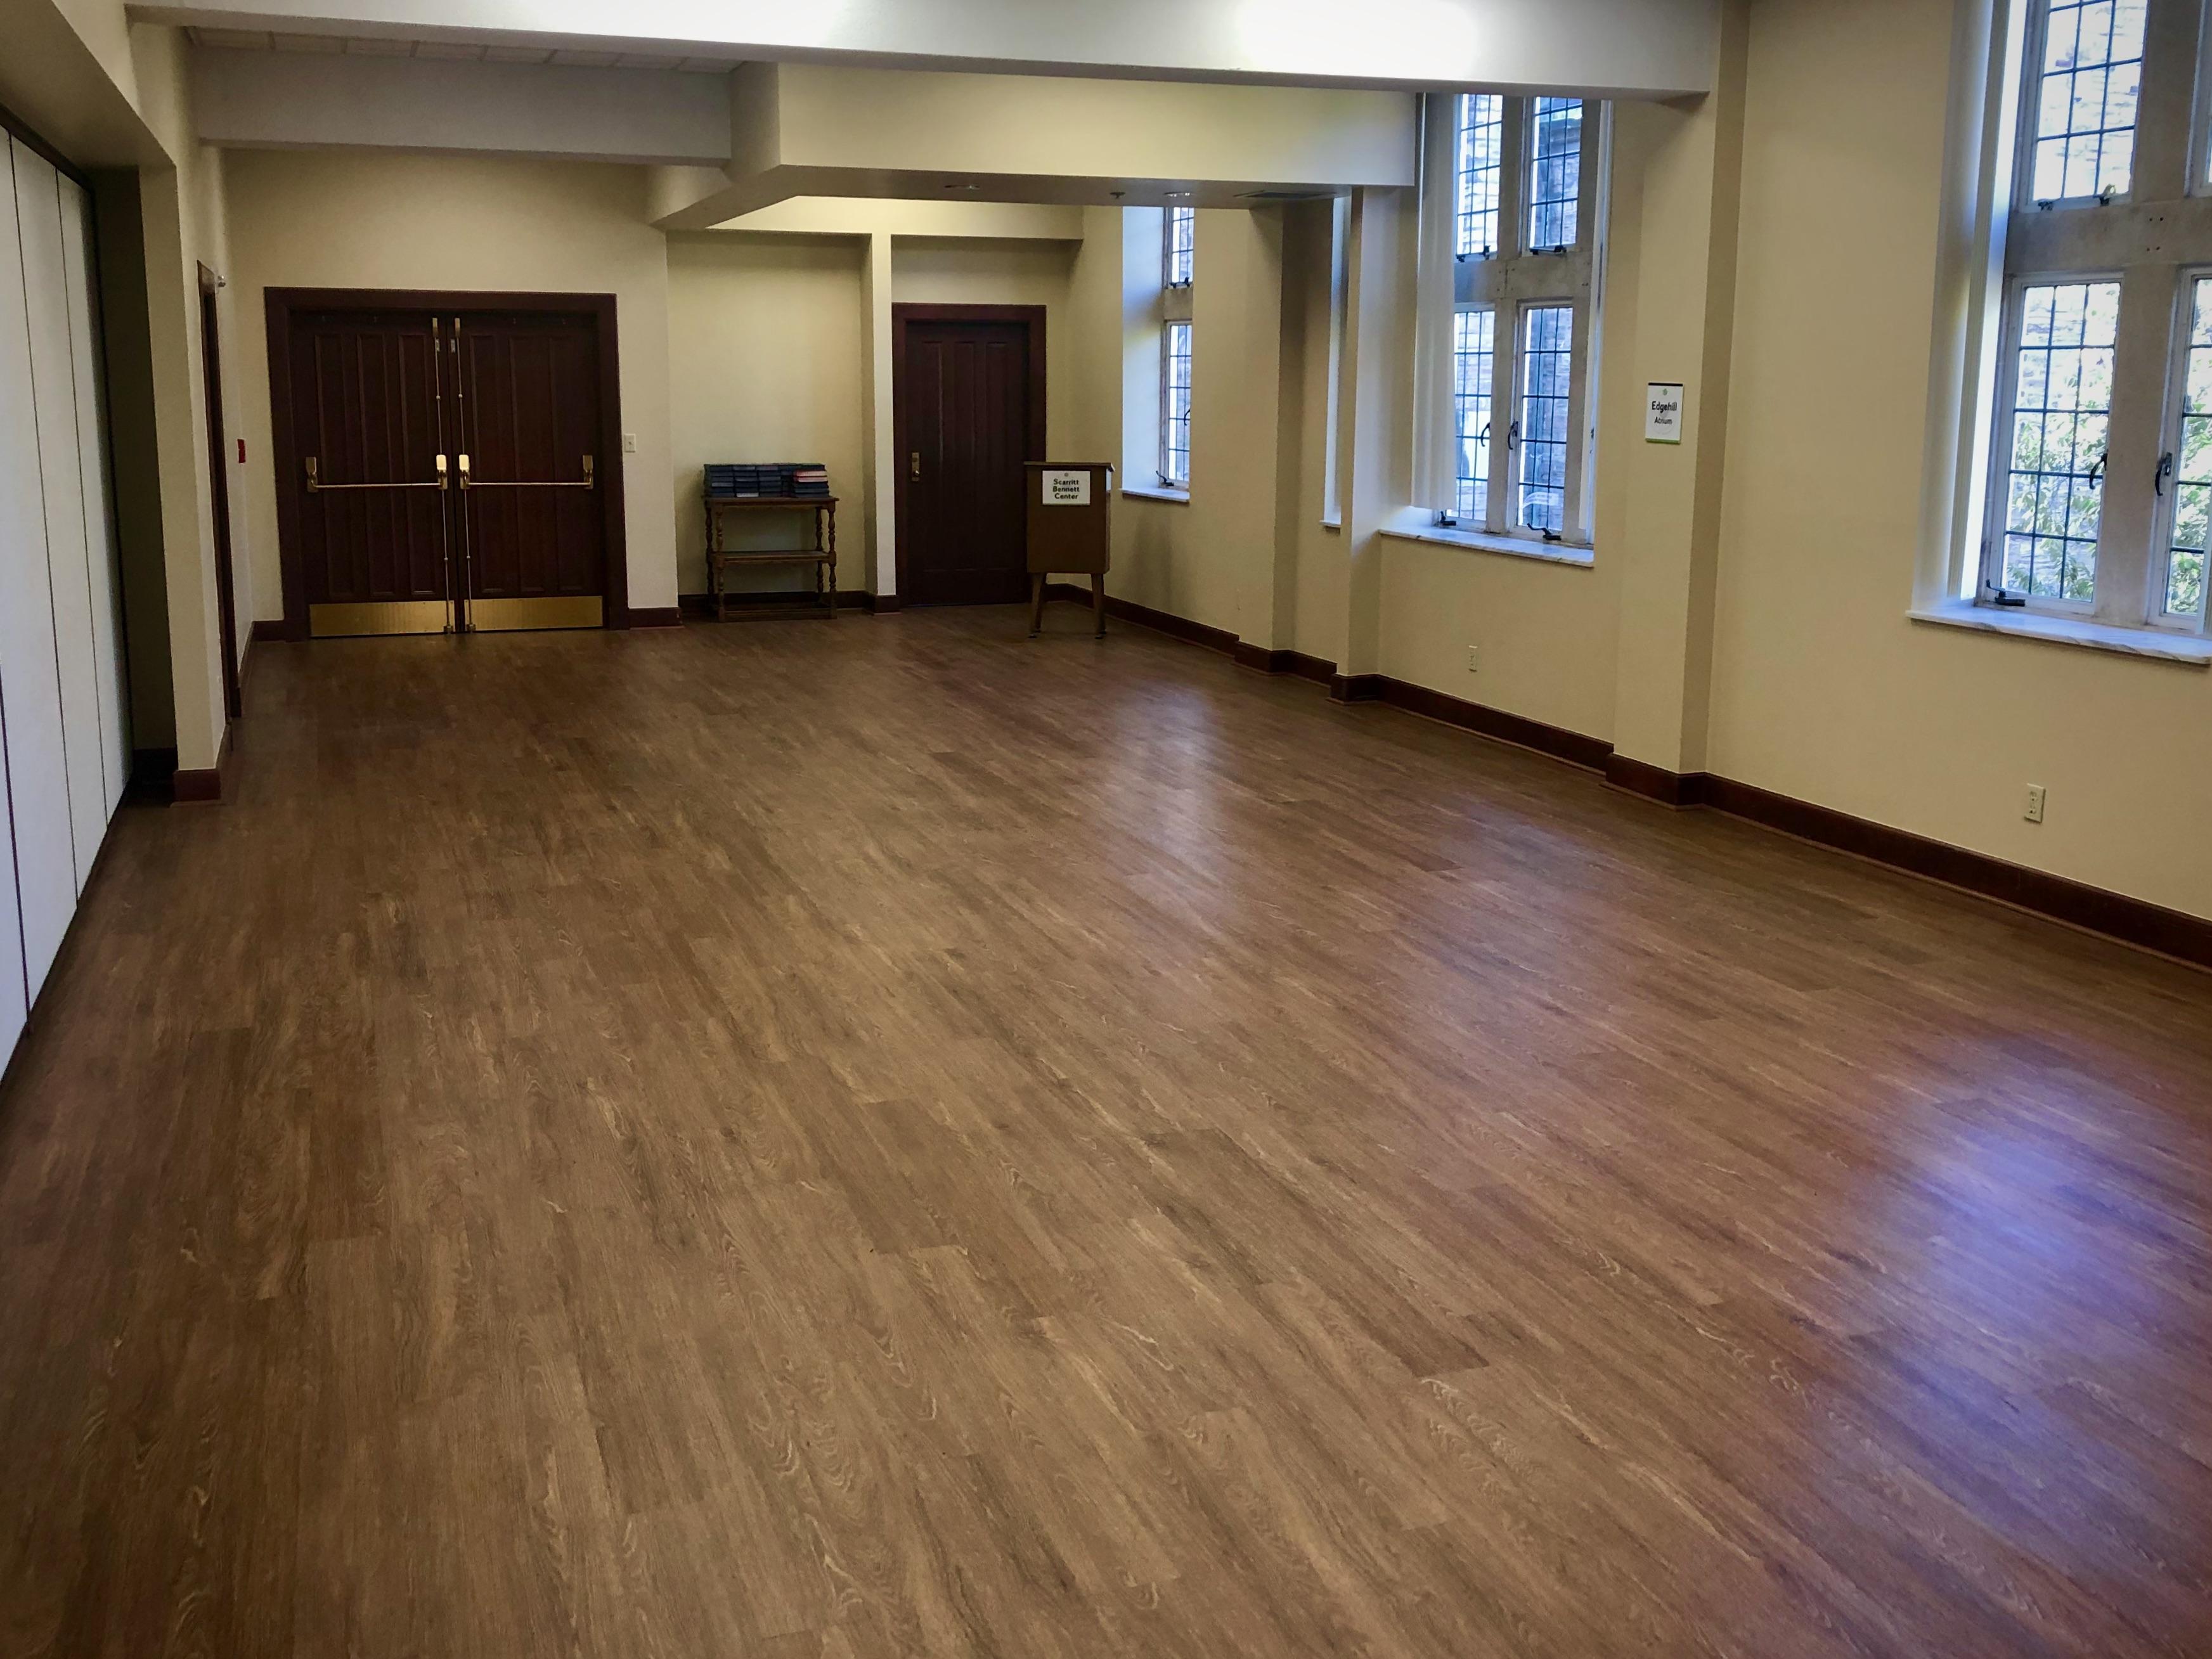 Large atrium with wood floors